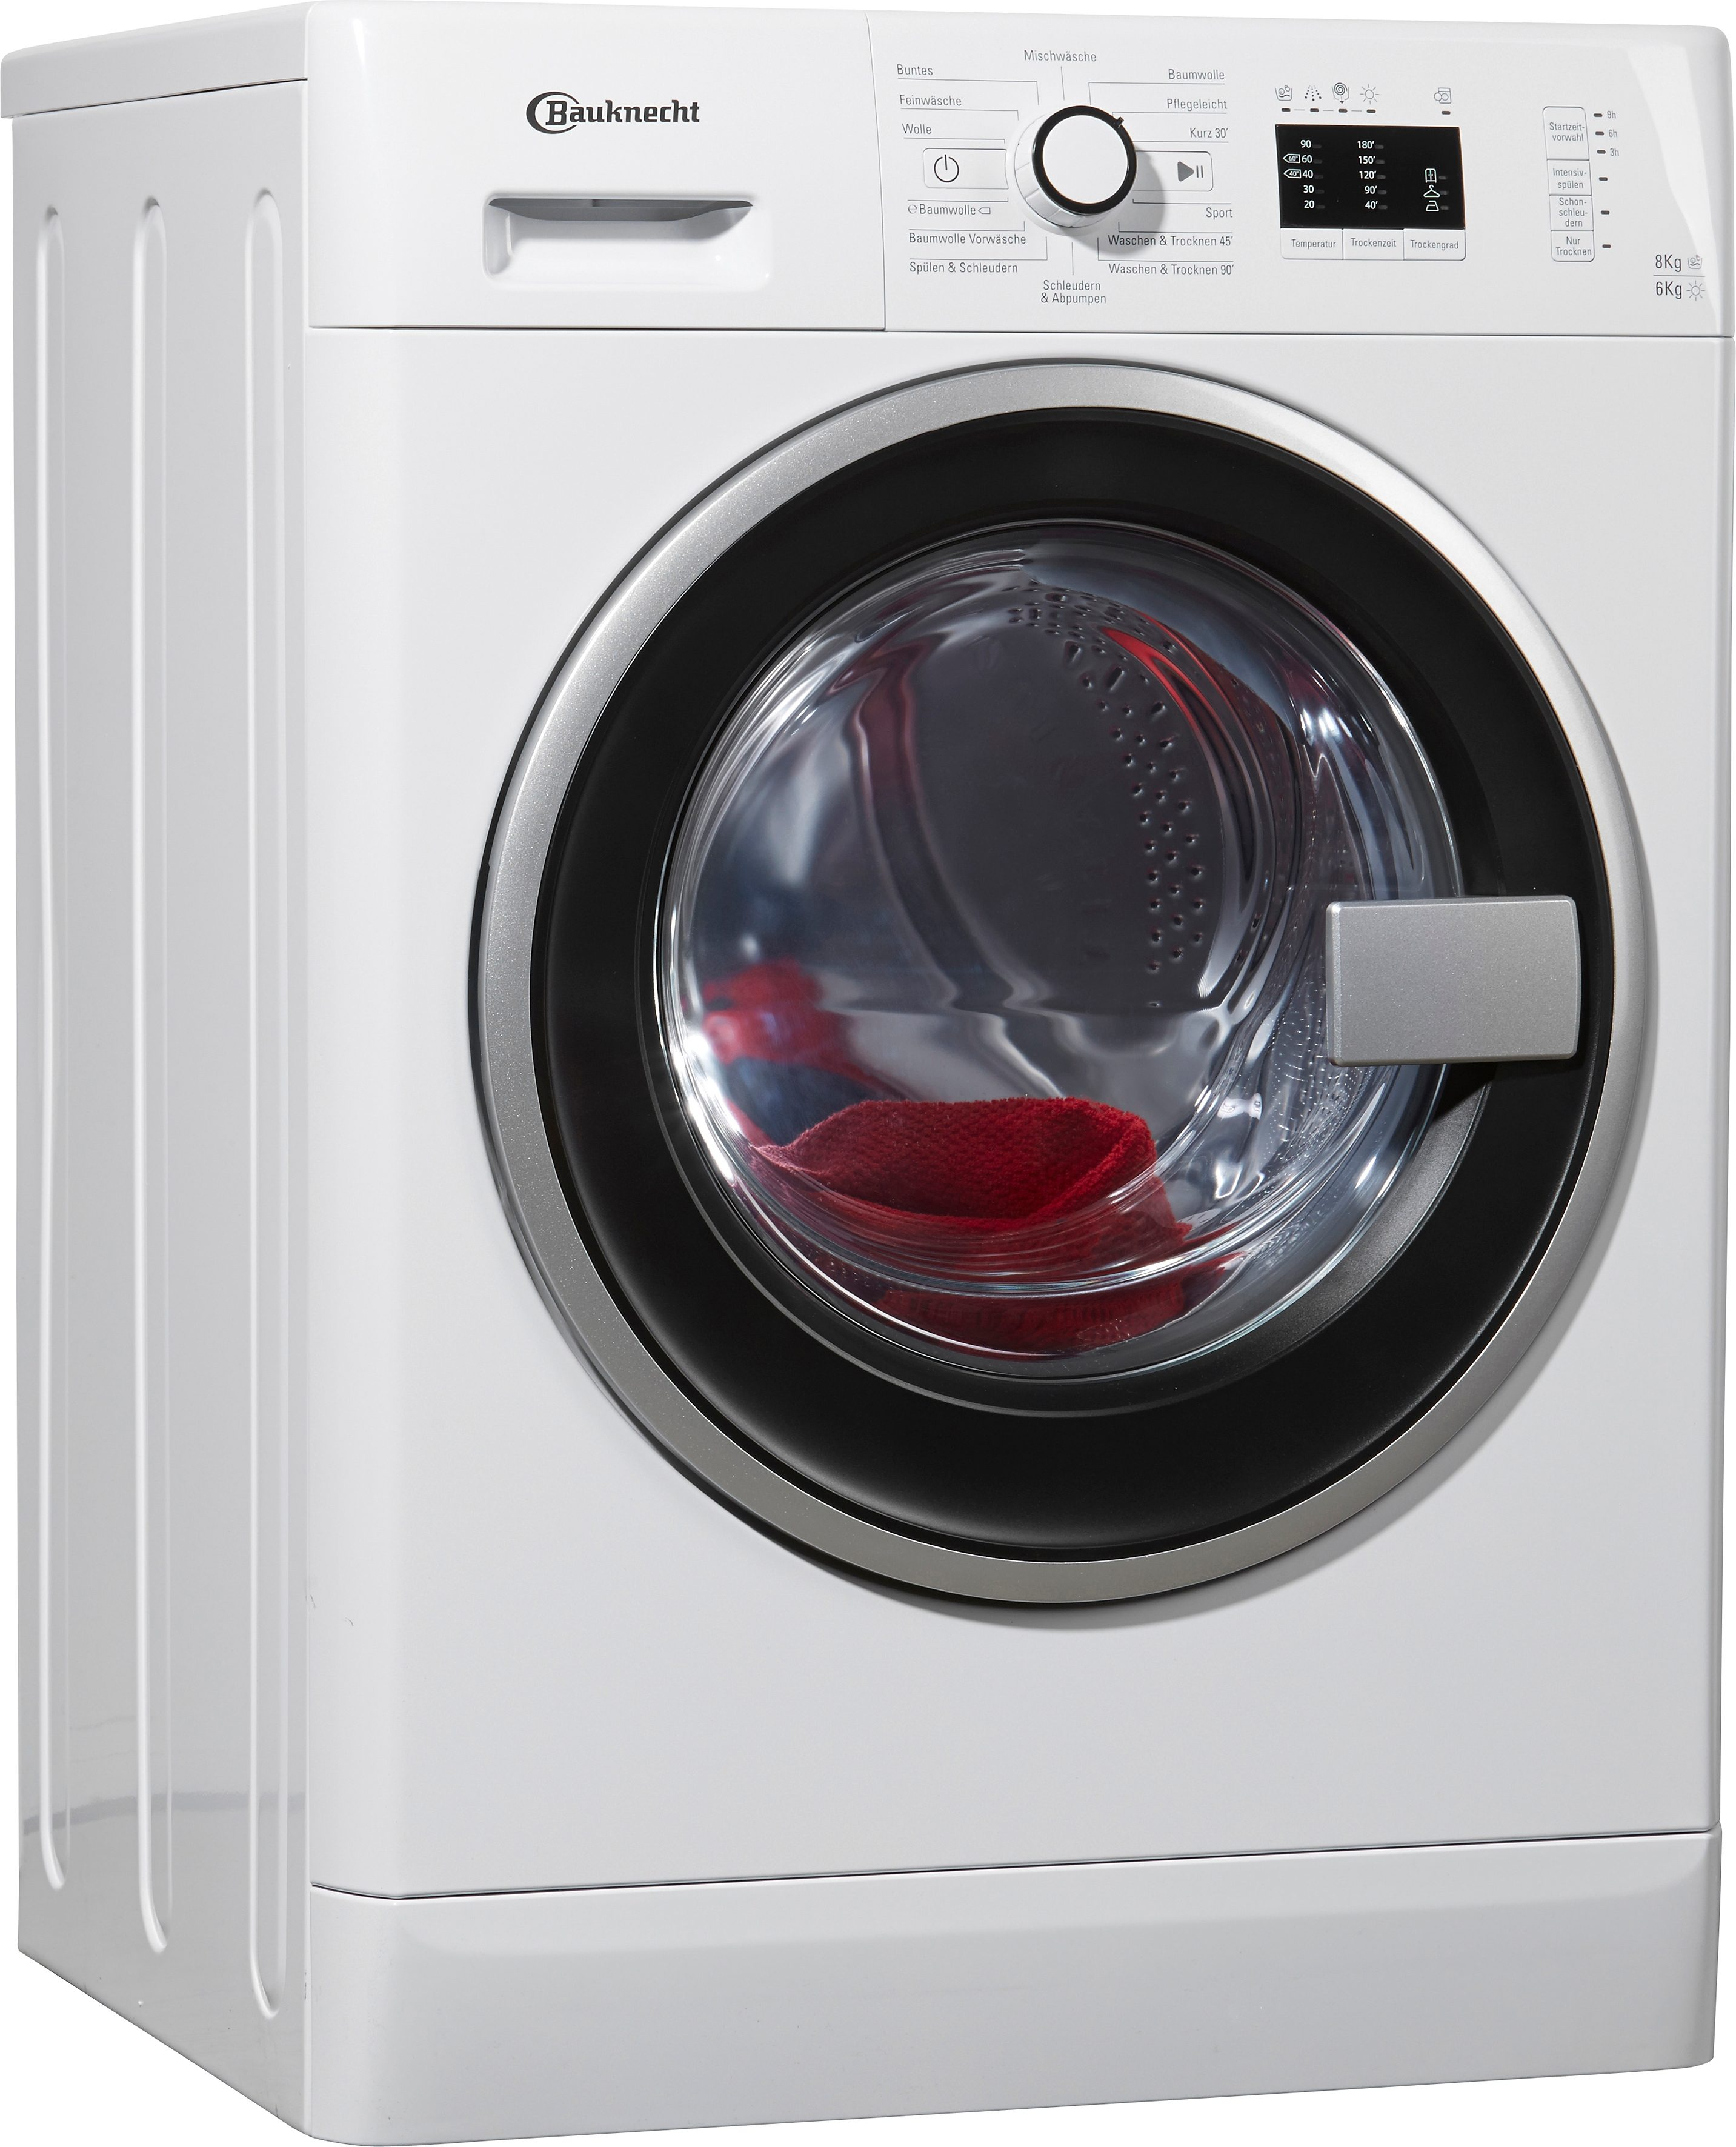 BAUKNECHT Waschtrockner WATK Prime 8612, A, 8 kg / 6 kg, 1.200 U/Min